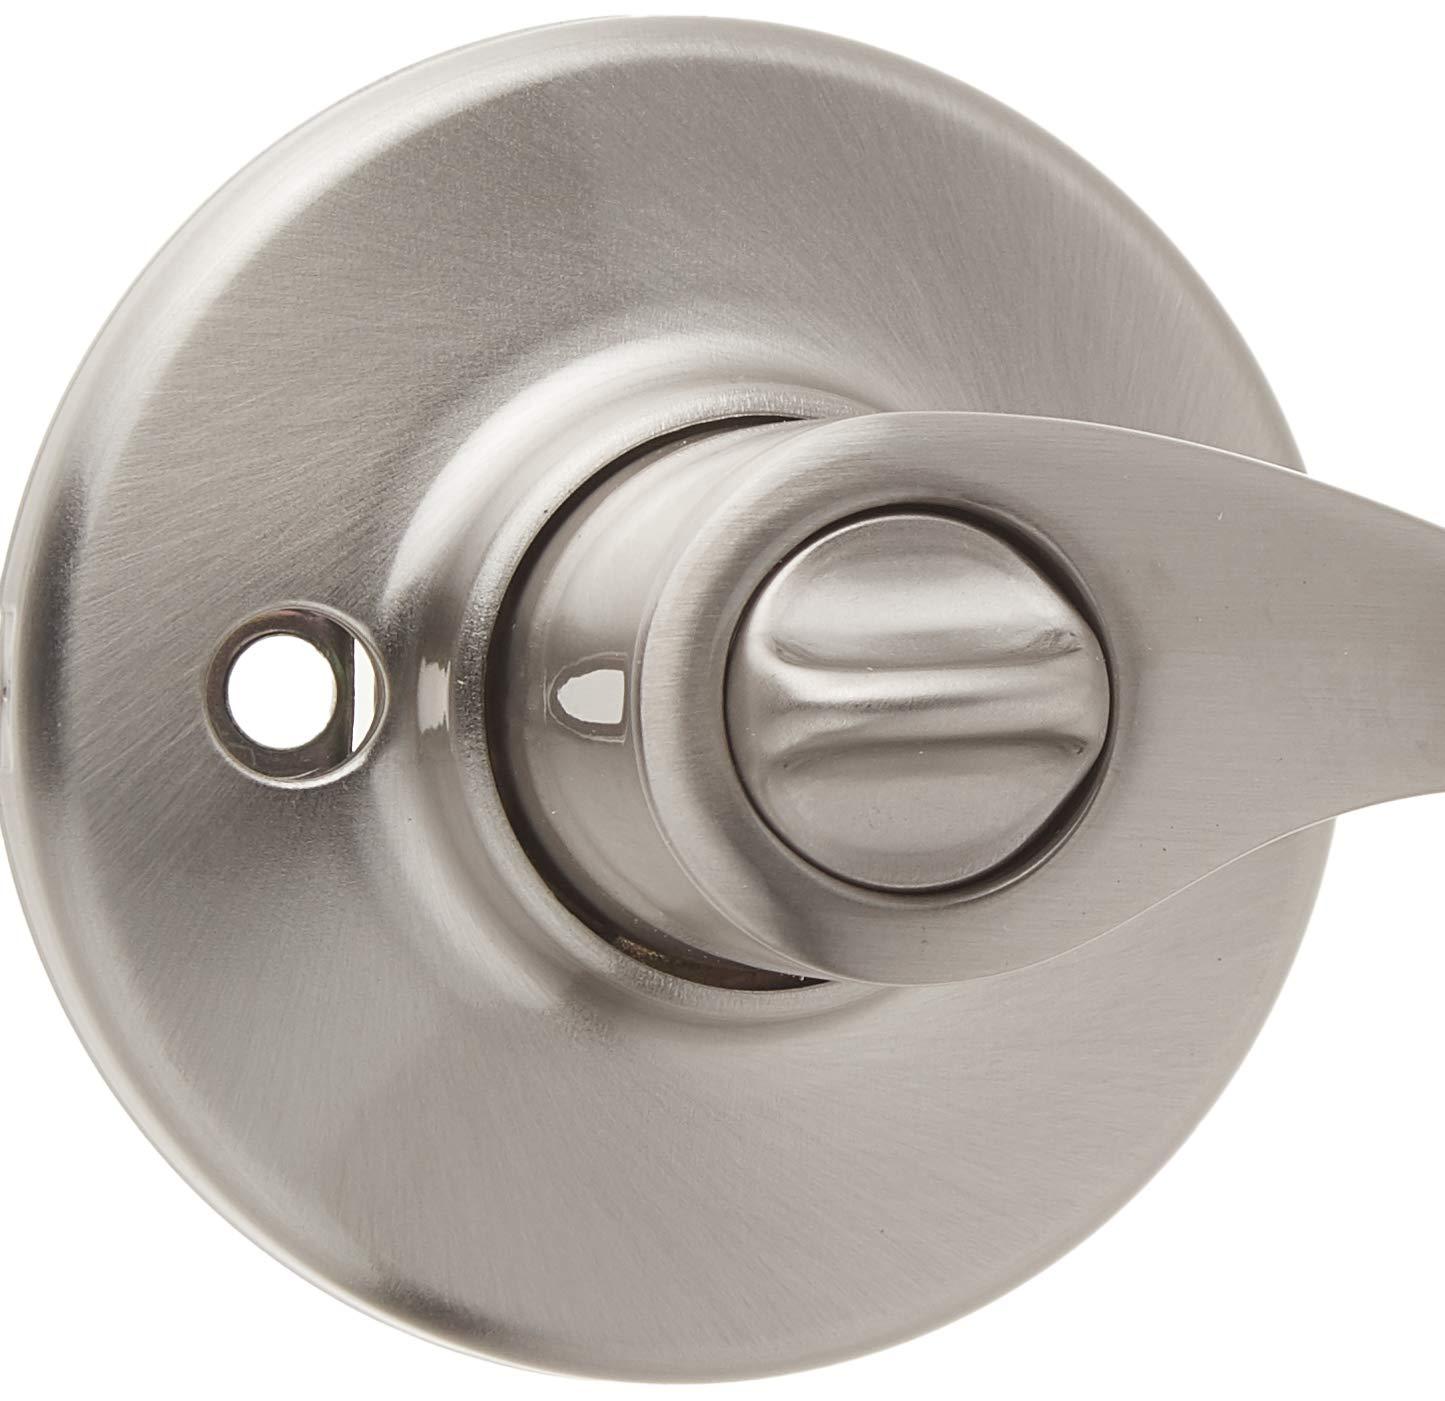 Exterior Door Handle Weiser Belmont Entry Lever Featuring SmartKey 9GLC5350-034 Satin Nickel